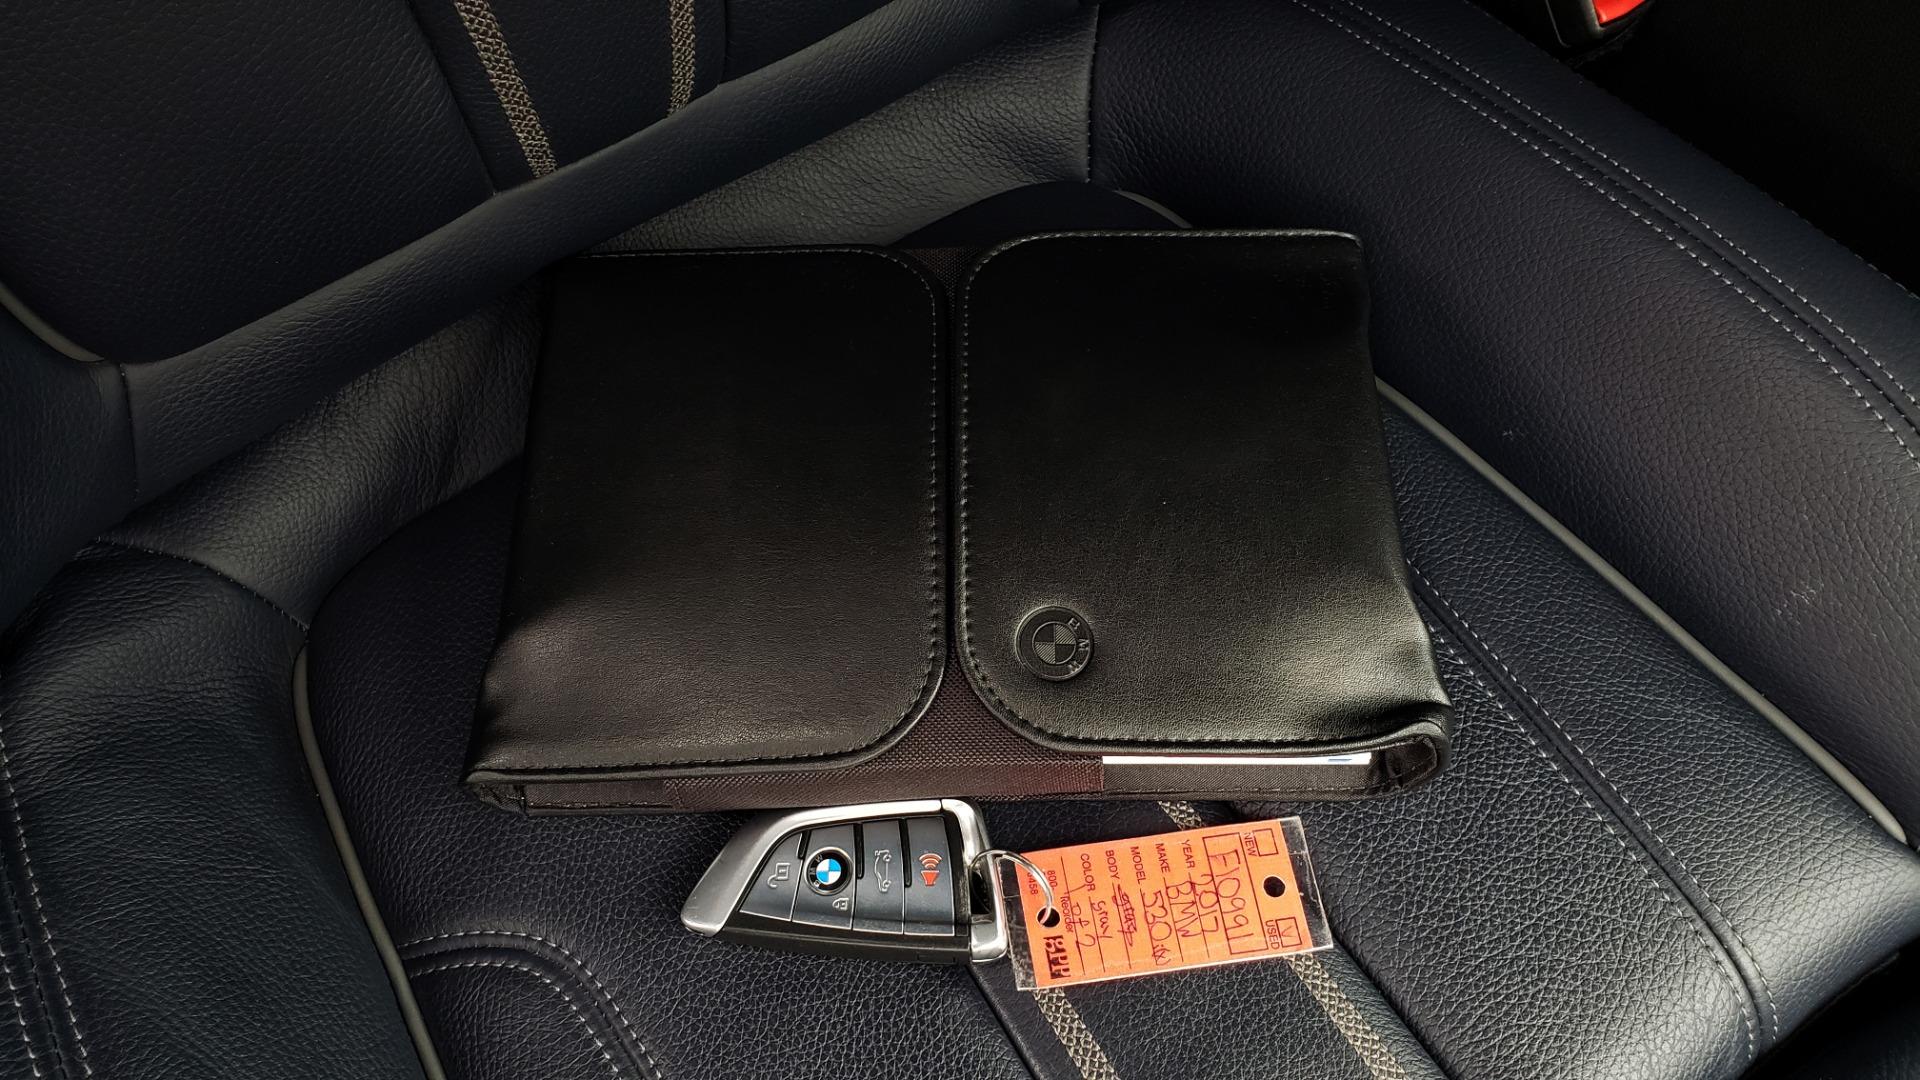 Used 2017 BMW 5 SERIES 530IXDRIVE / PREM PKG / DRVR ASST PLUS / CLD WTHR / APPLE CARPLAY for sale $30,595 at Formula Imports in Charlotte NC 28227 89